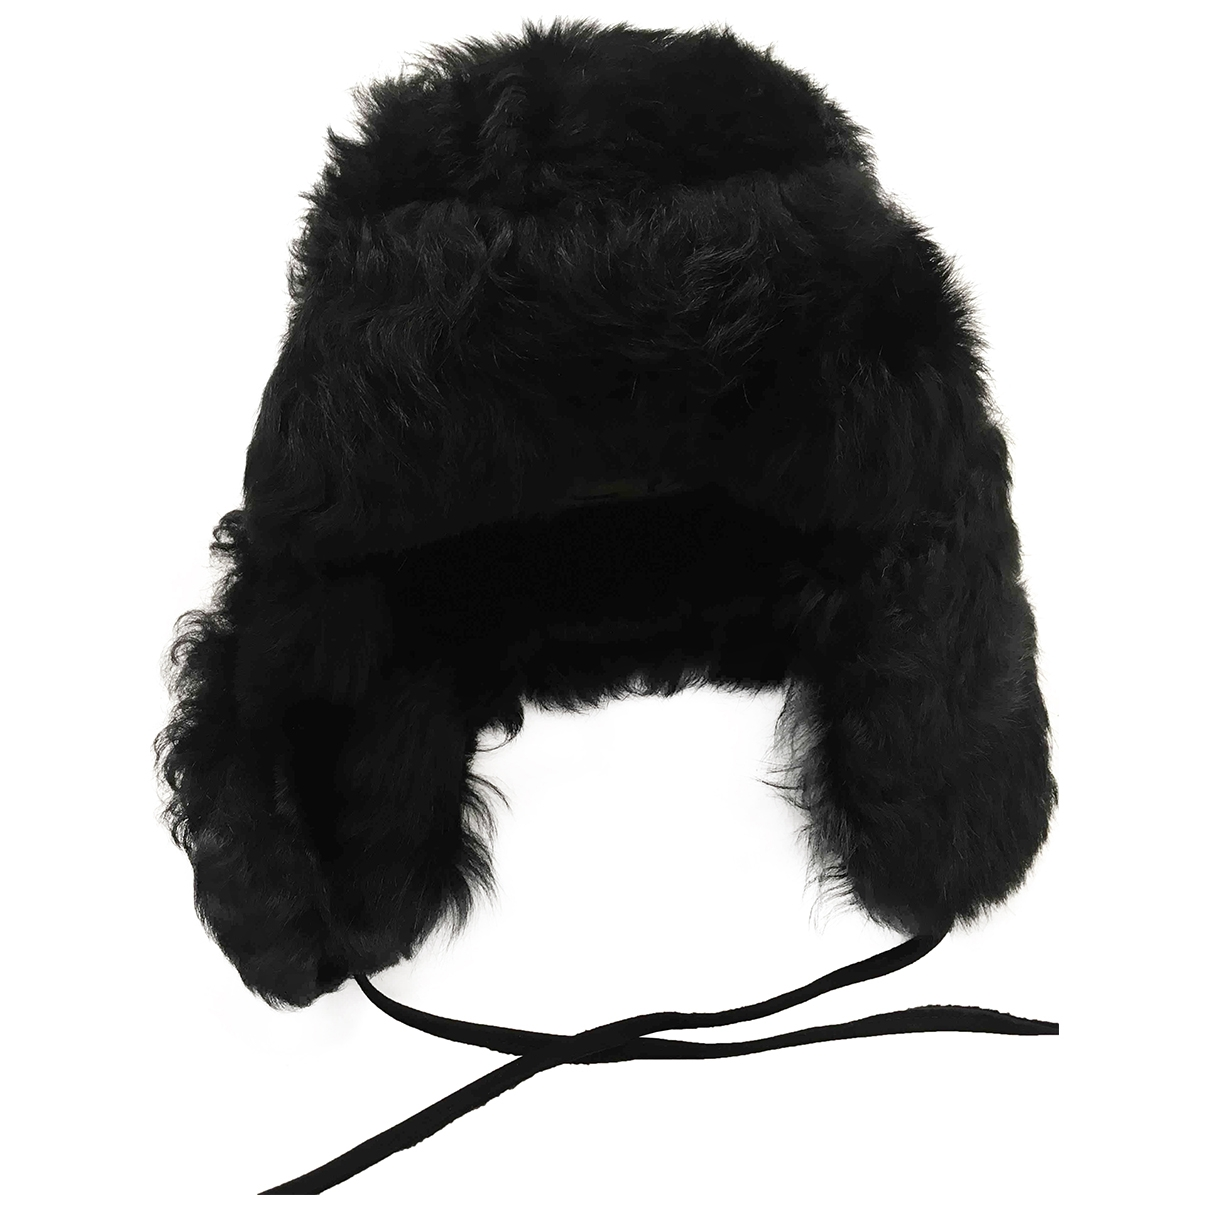 Paul Smith \N Black Leather hat & pull on hat for Men L International